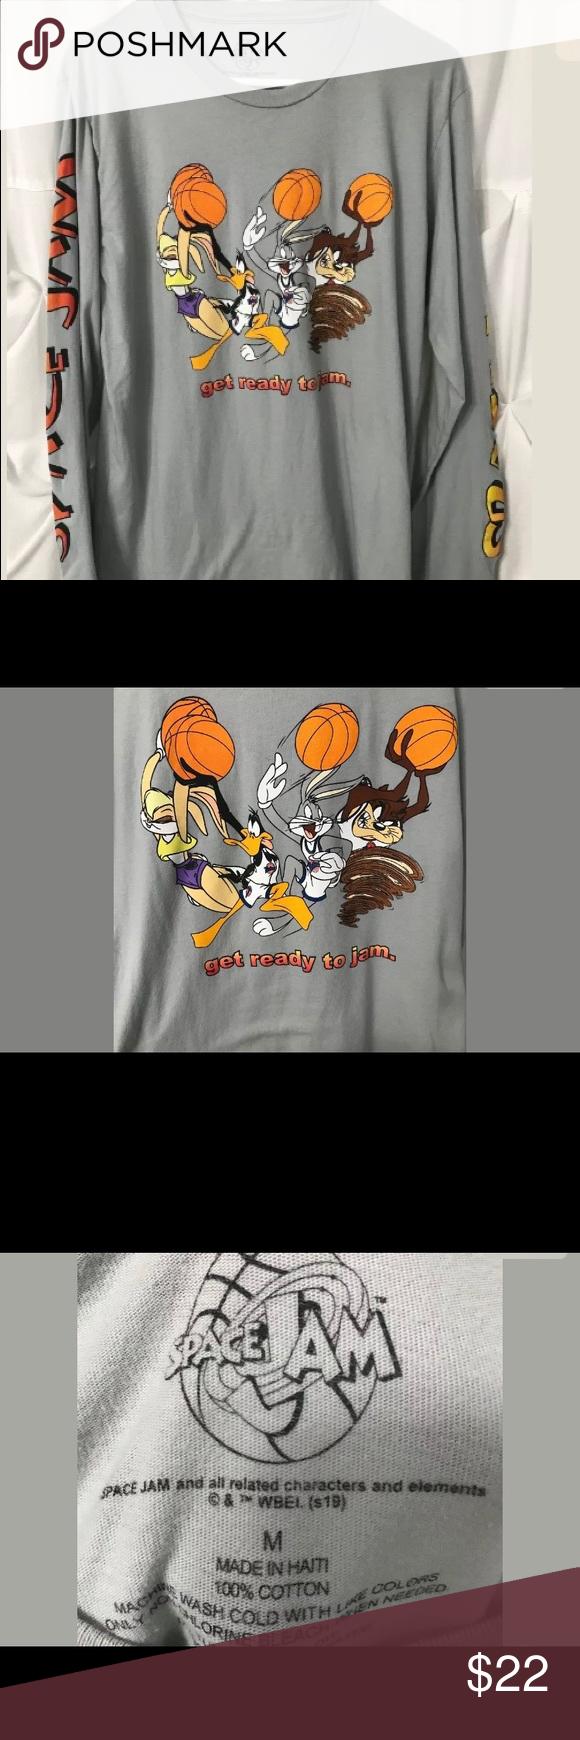 Space Jam Unisex Ls T Shirt Gray Looney Toons Space Jam Unisex Long Sleeve T Shirt Gray Good Condition Shirts Grey Men S Long Sleeve T Shirt Long Sleeve Tees